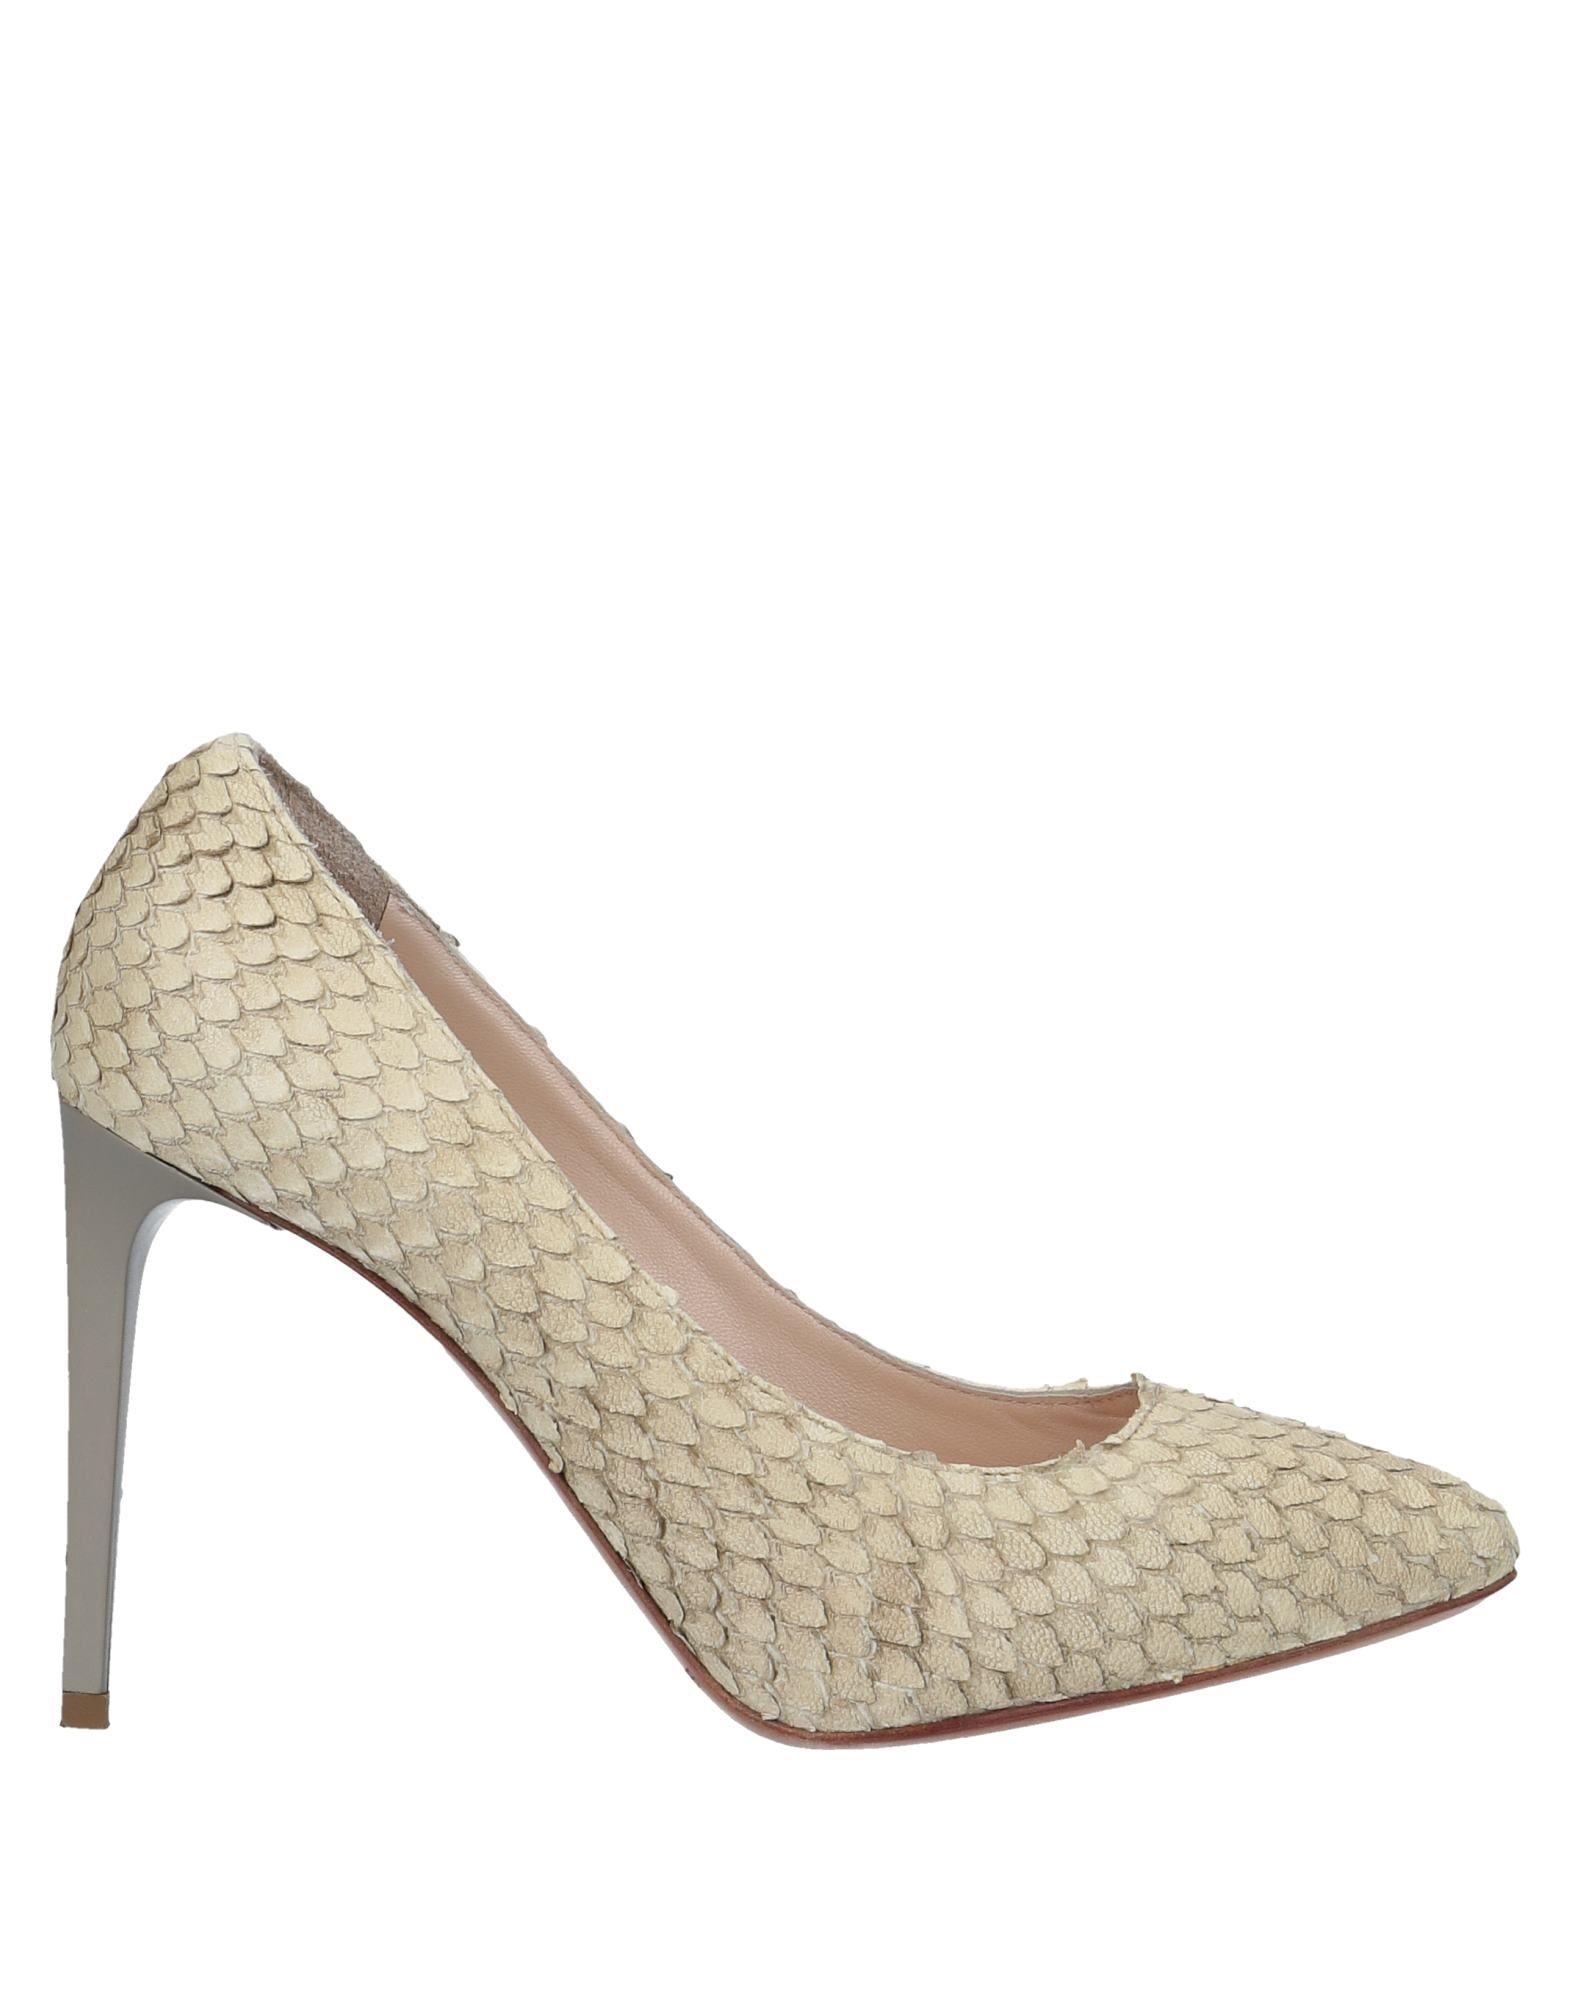 Emanuela Passeri Pumps Damen  11508430AP Gute Qualität beliebte Schuhe